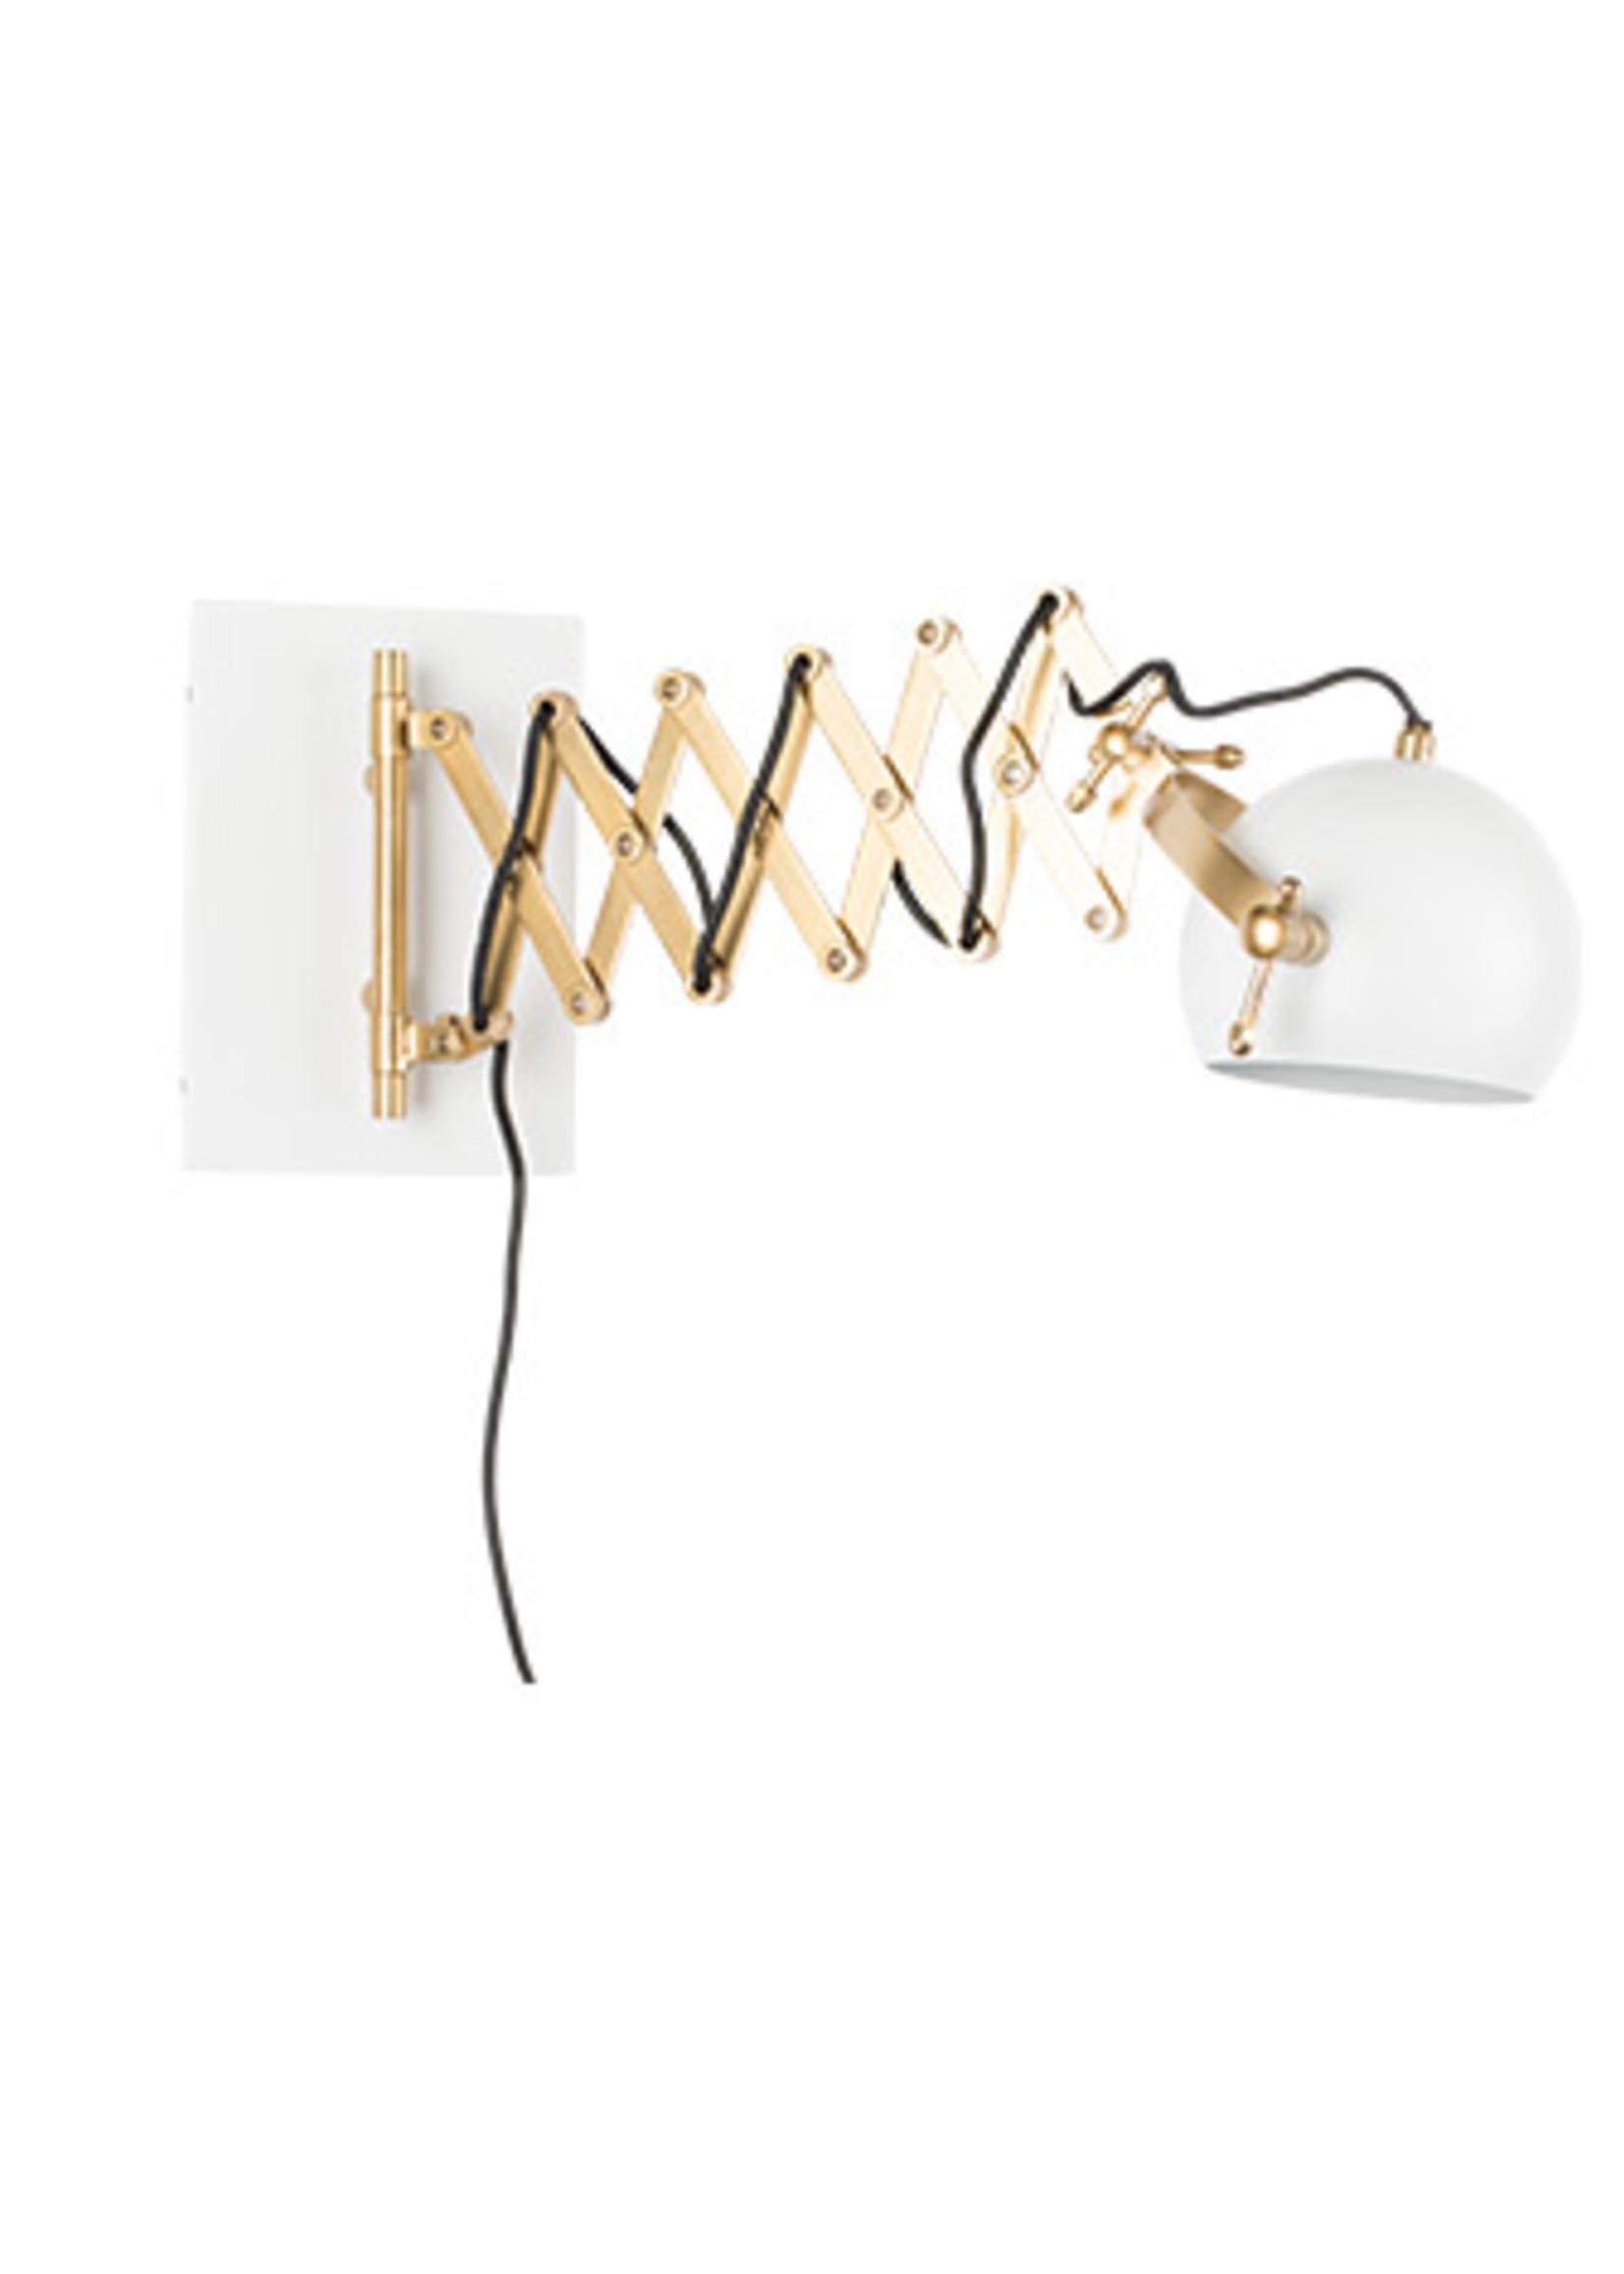 Zuiver Wall lamp sarana wit/groen